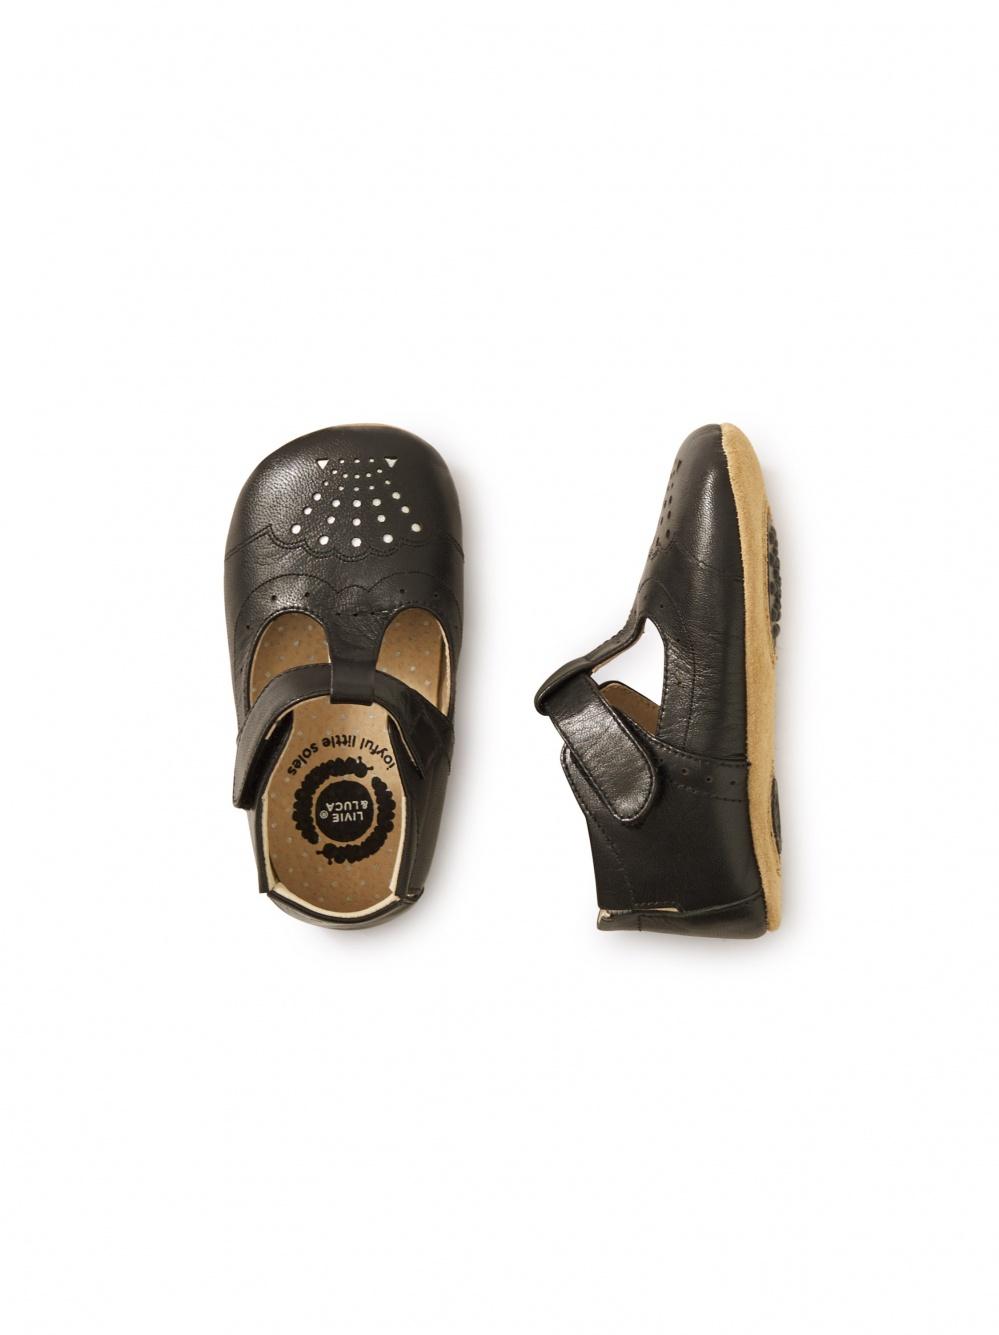 Cora Shoe